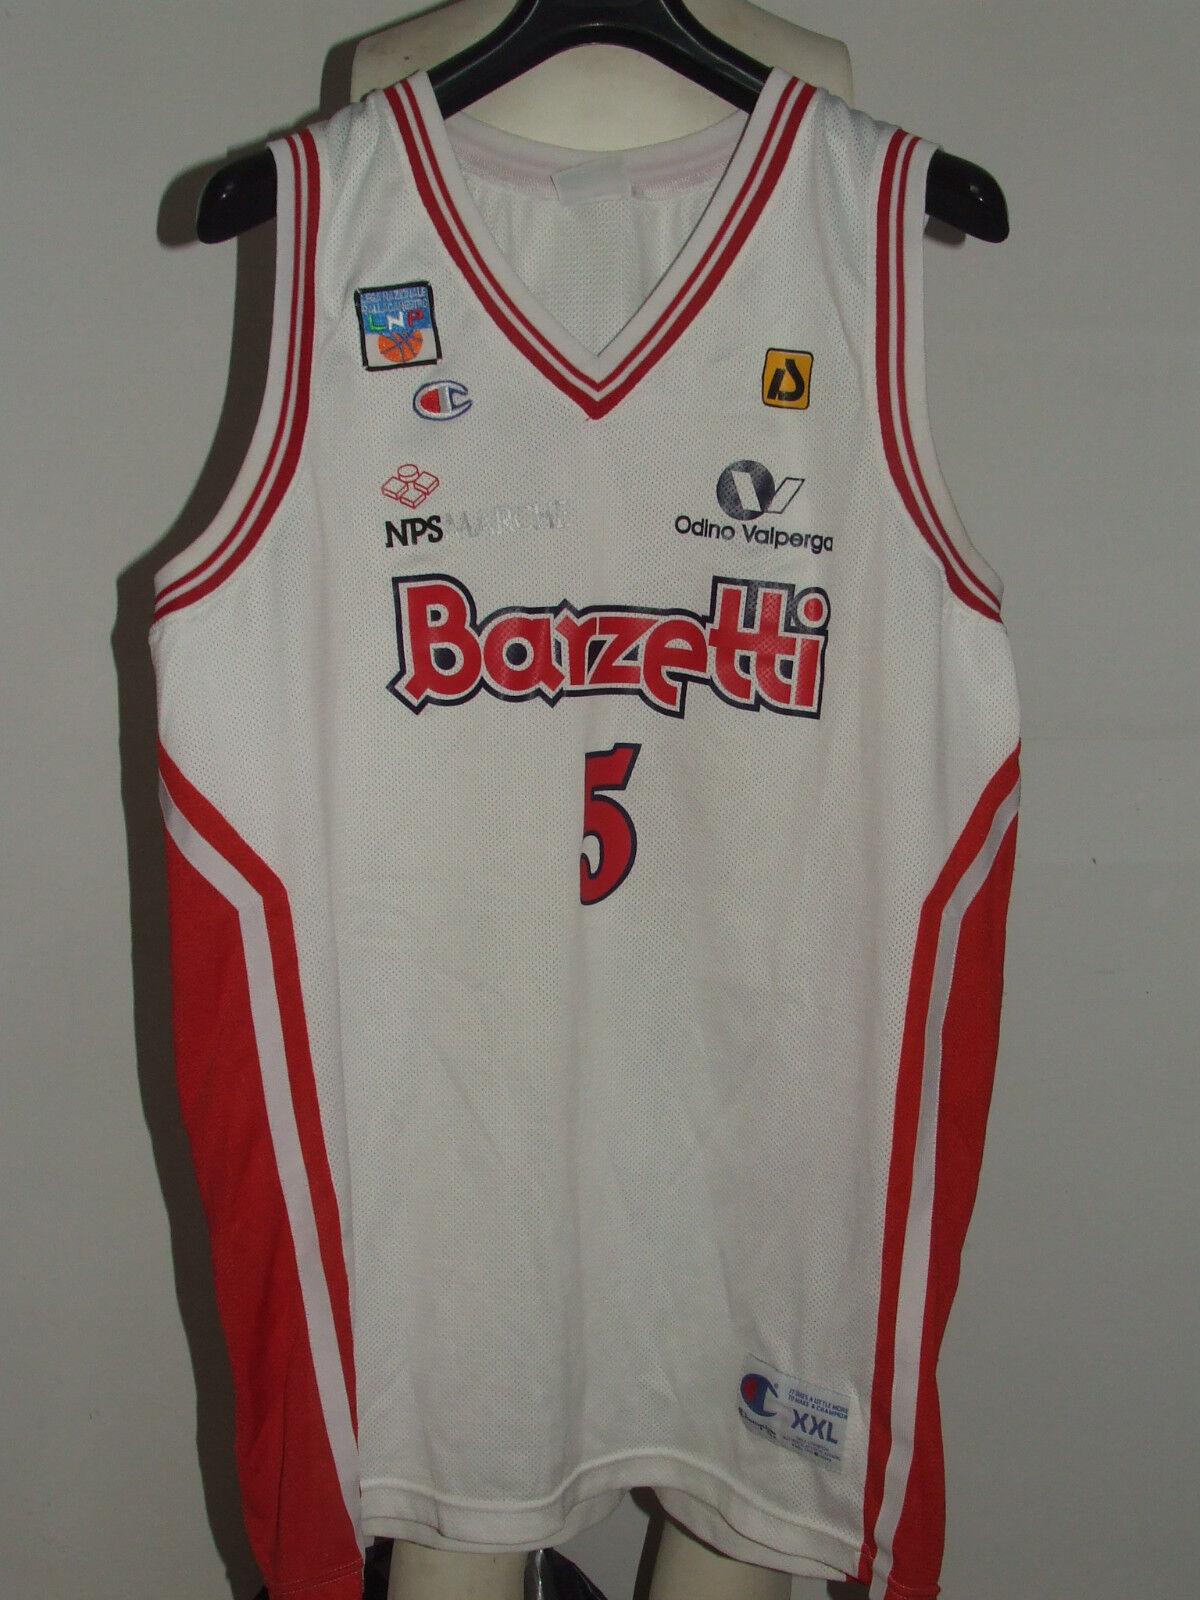 Trikot Maillot Trägerhemd Basketball matchworn Babu Senigallia Senigallia Senigallia No. 5  | Stilvoll und lustig  80ae9e